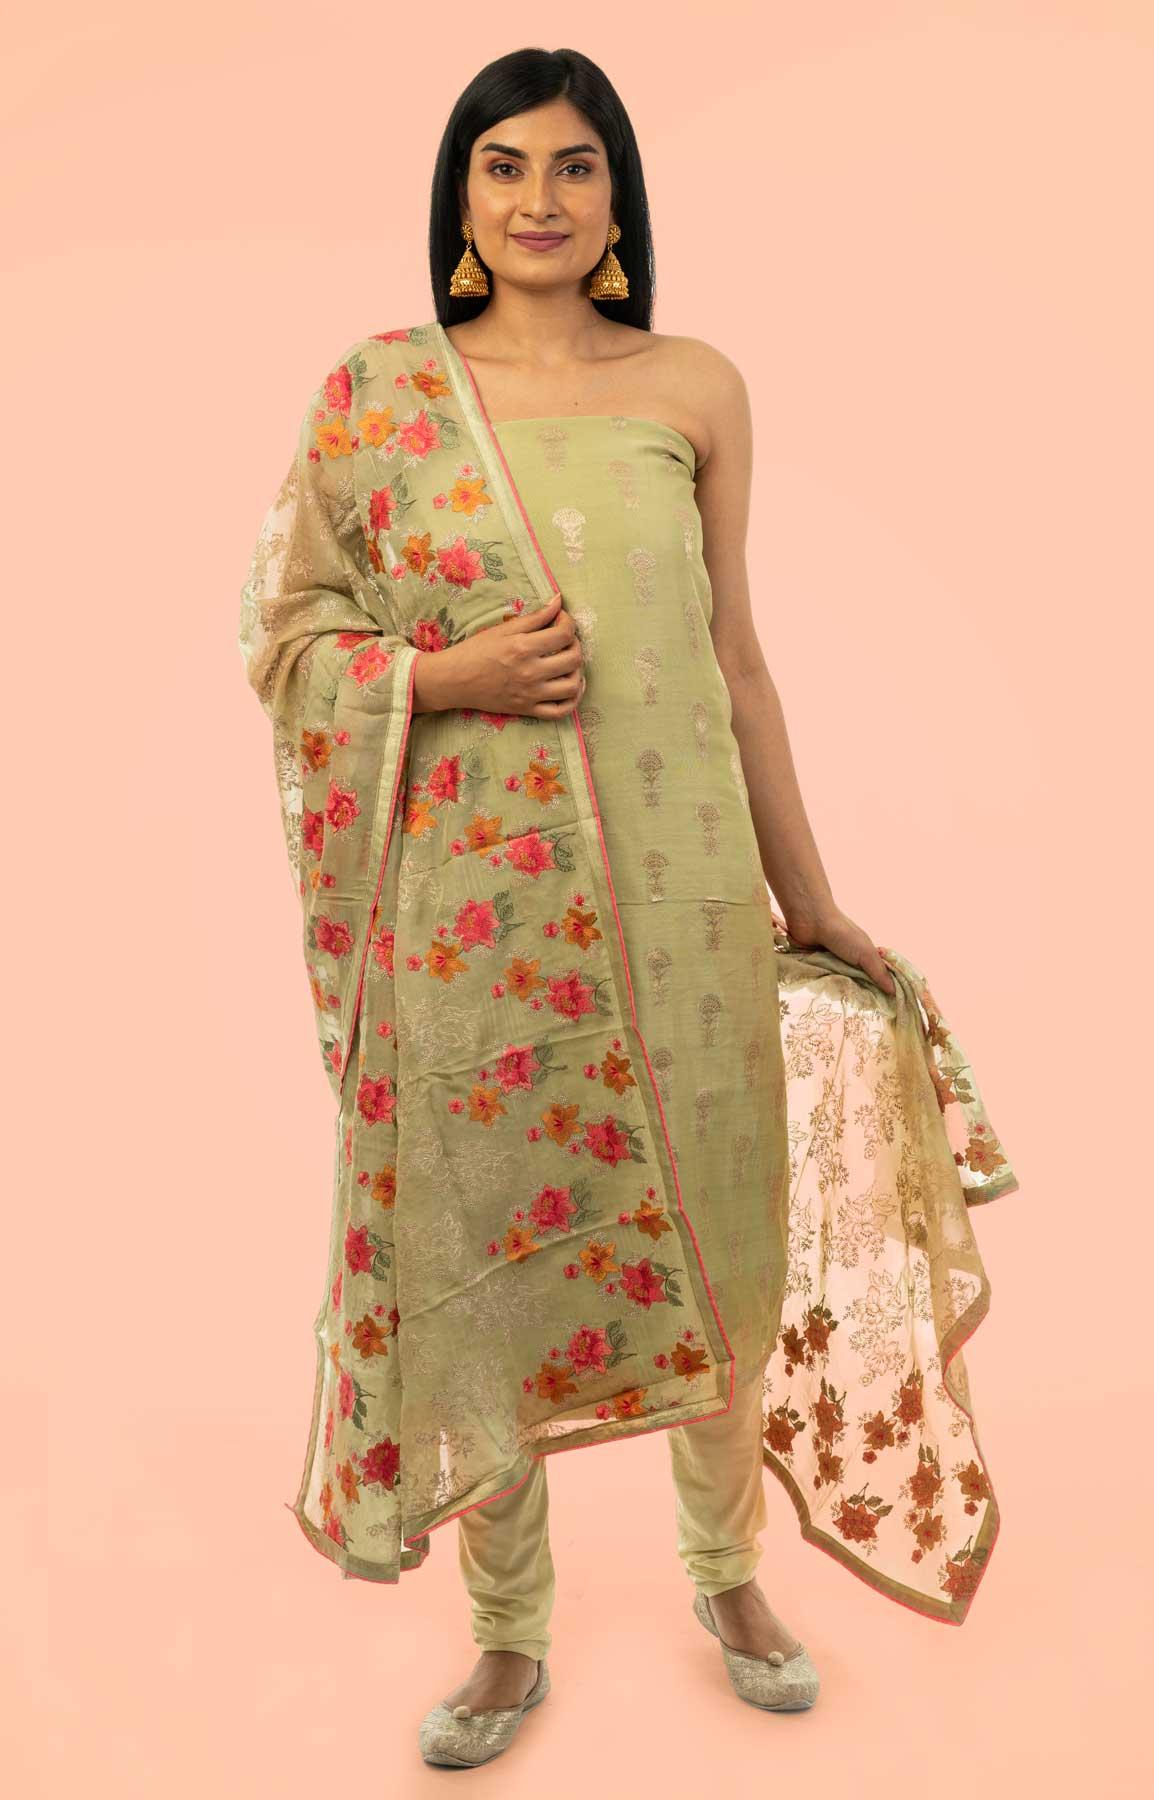 Pista Green Banarasi Chanderi Suit Fabric With Phulkari Dupatta – Viraaya By Ushnakmals – Viraaya By Ushnakmals